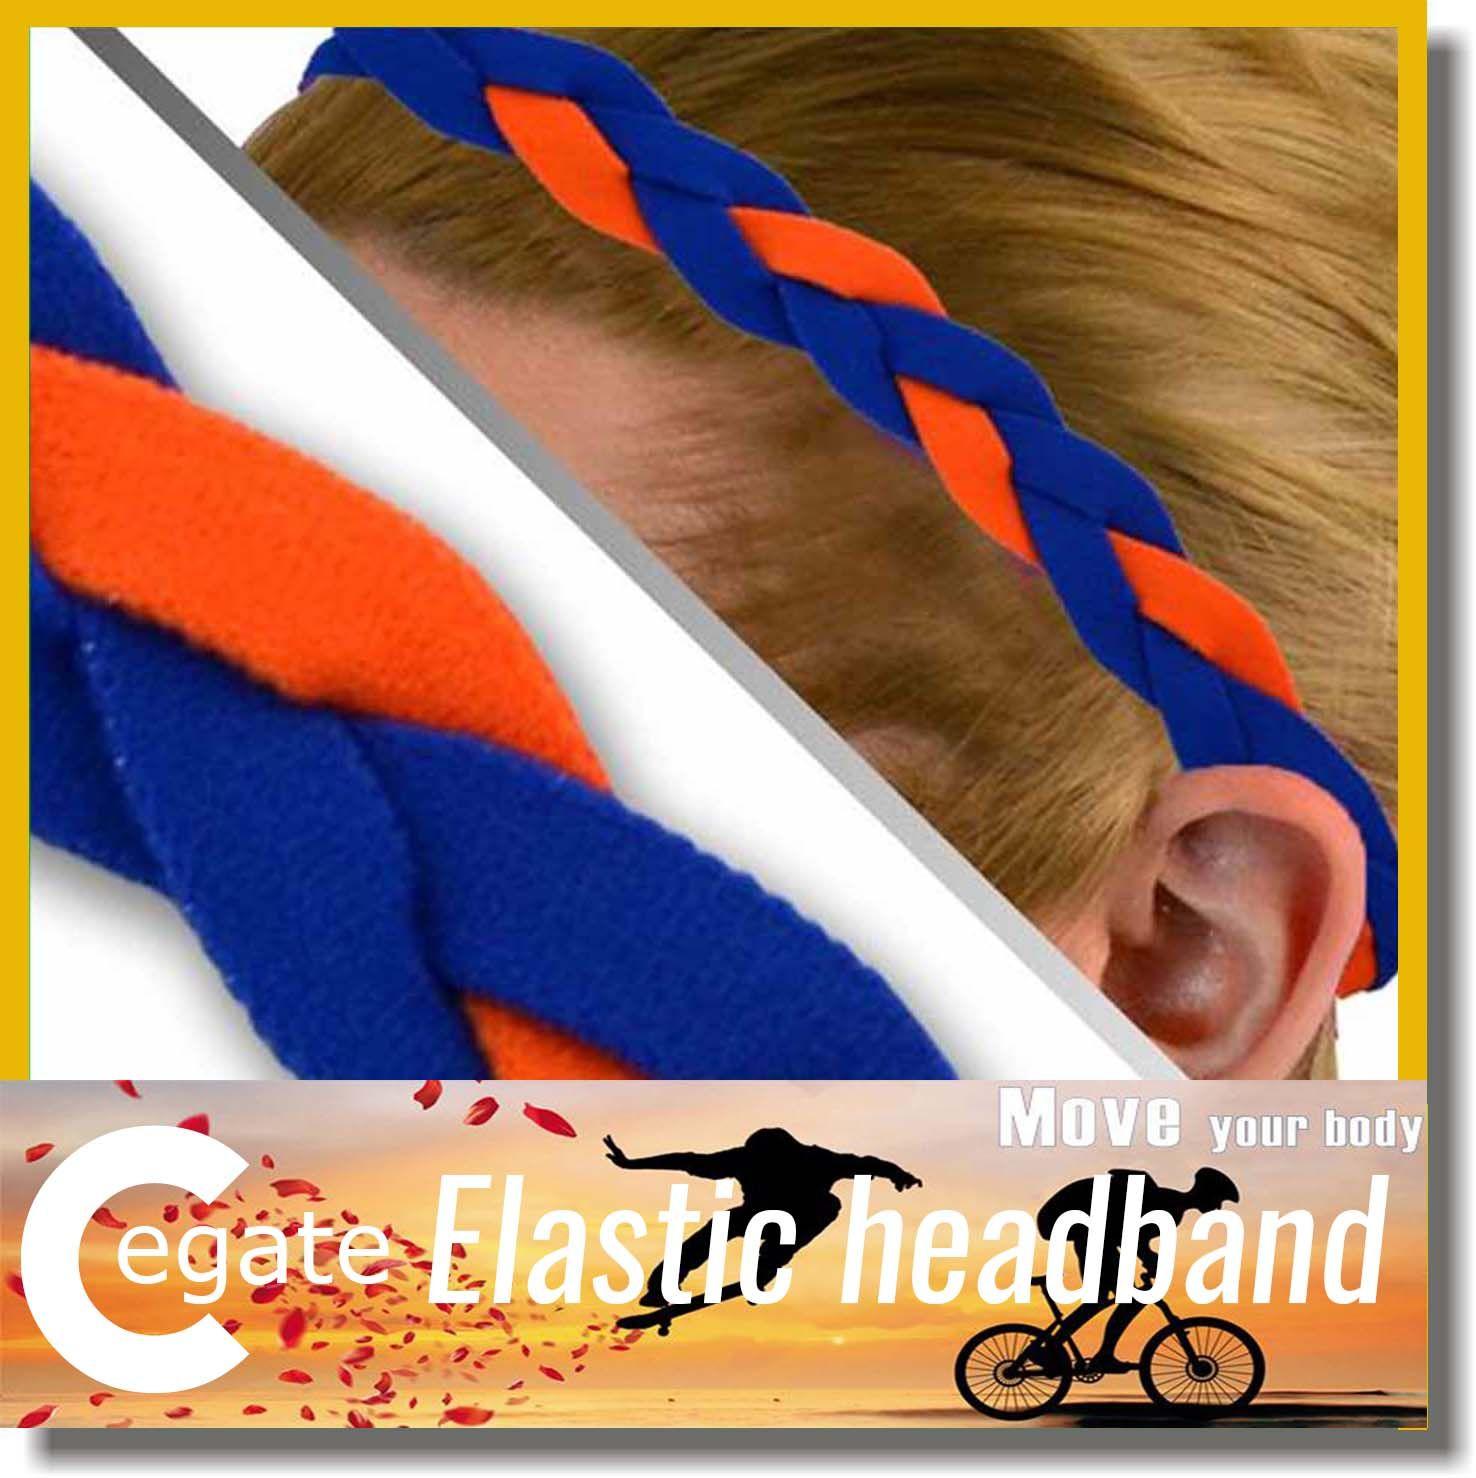 2016 Hot sale Slip Fashion Braided Yoga Headband Sports Elastic Braided Headband for women girl free shipping